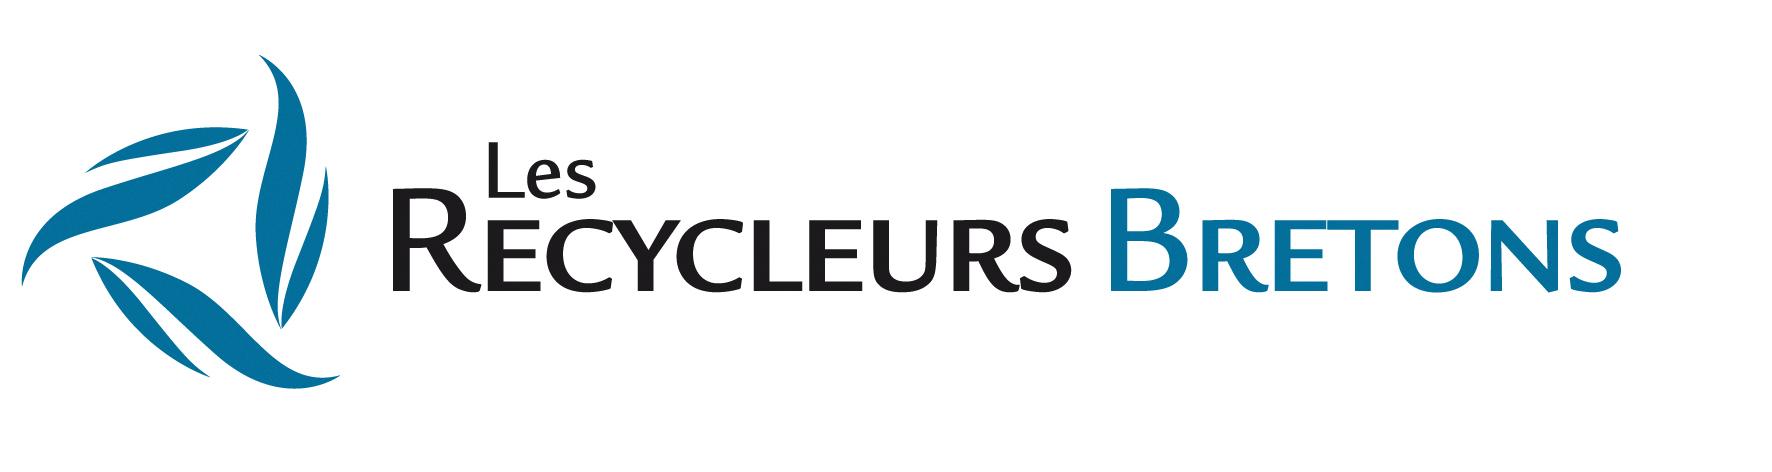 Recycleurs bretons